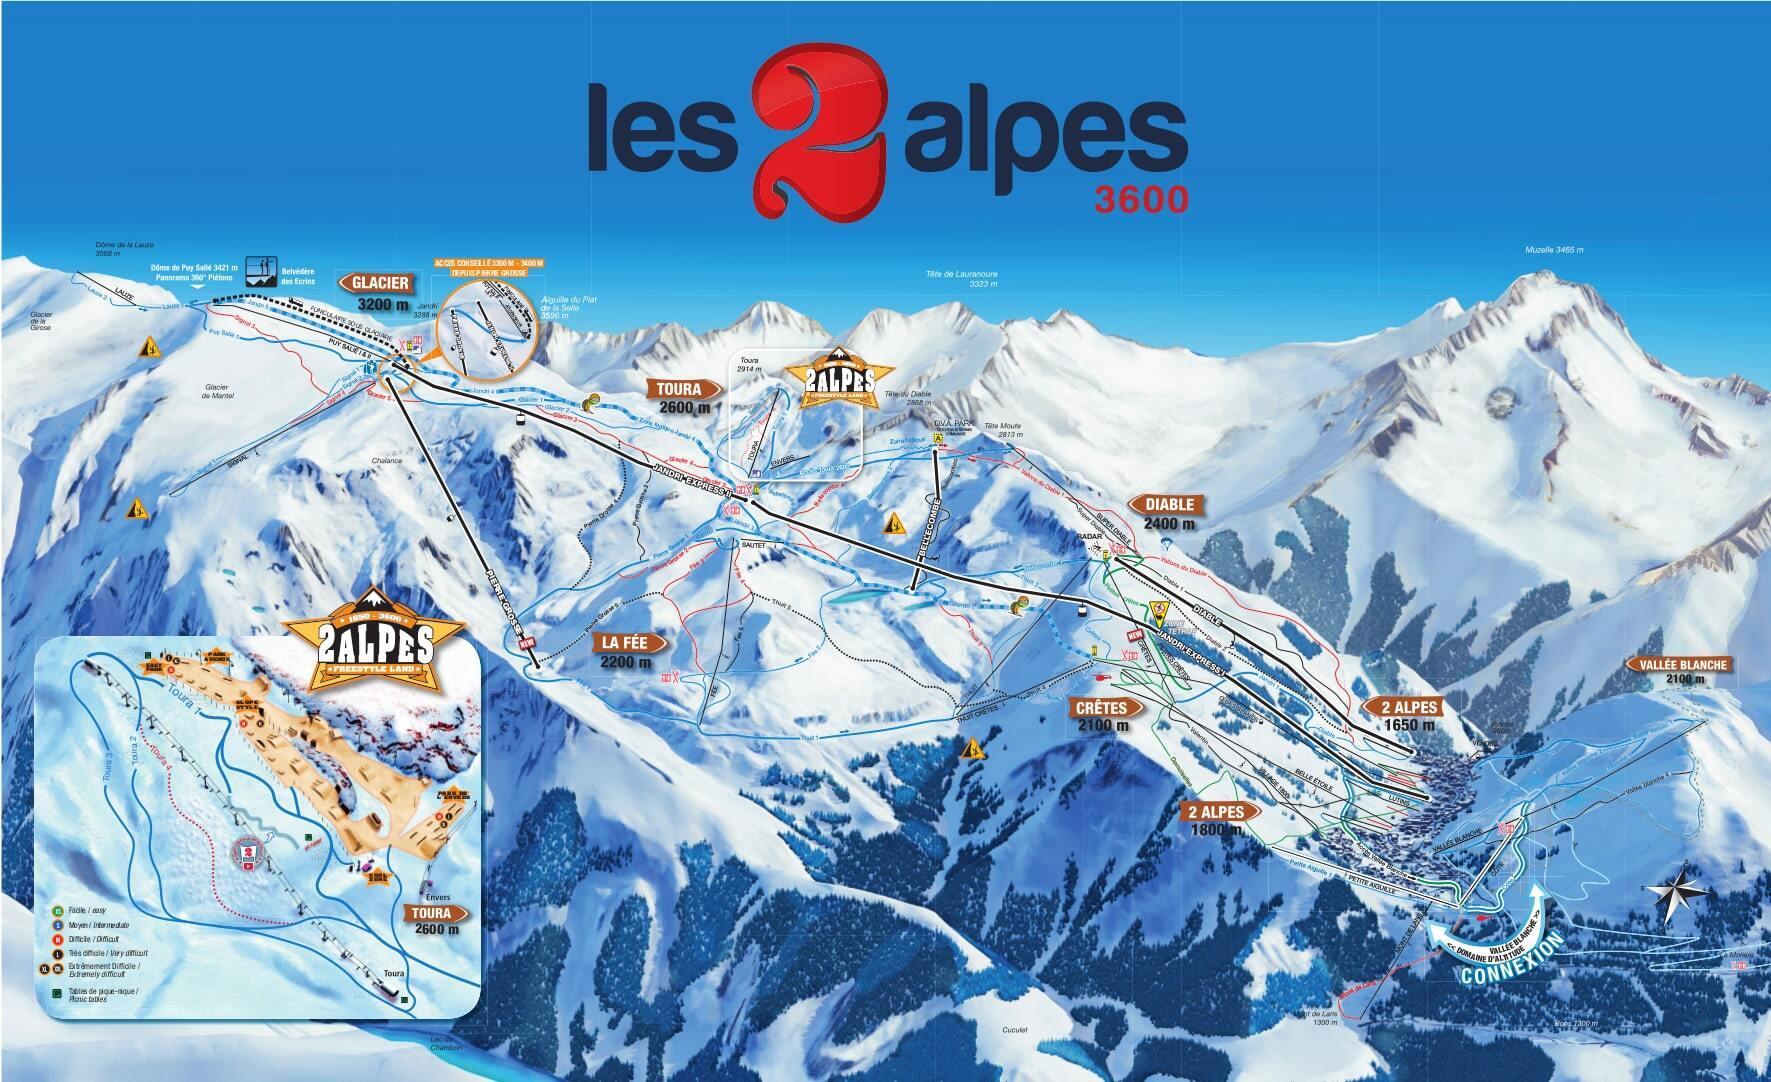 трасс в Les Deux Alpes